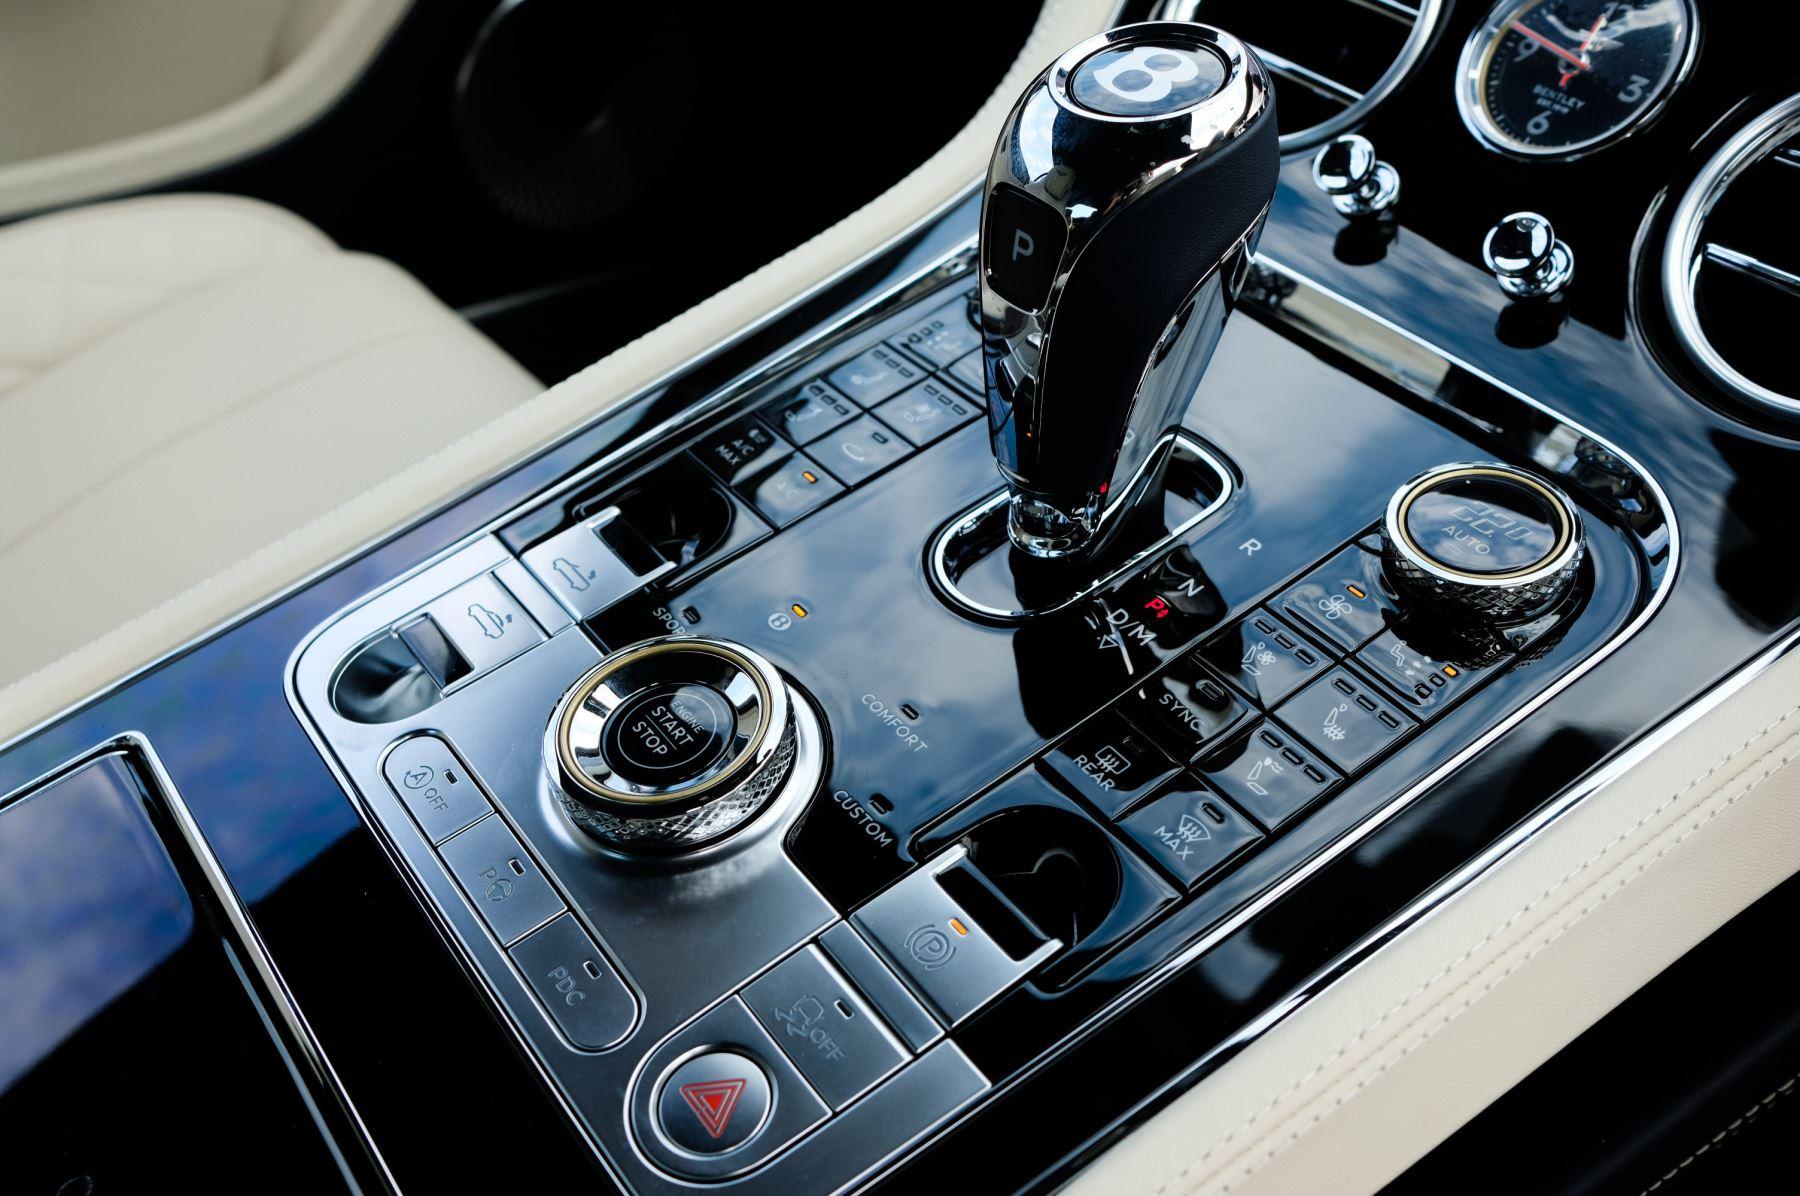 Bentley Continental GTC 4.0 V8 Mulliner Edition 2dr Auto [Tour Spec] image 20